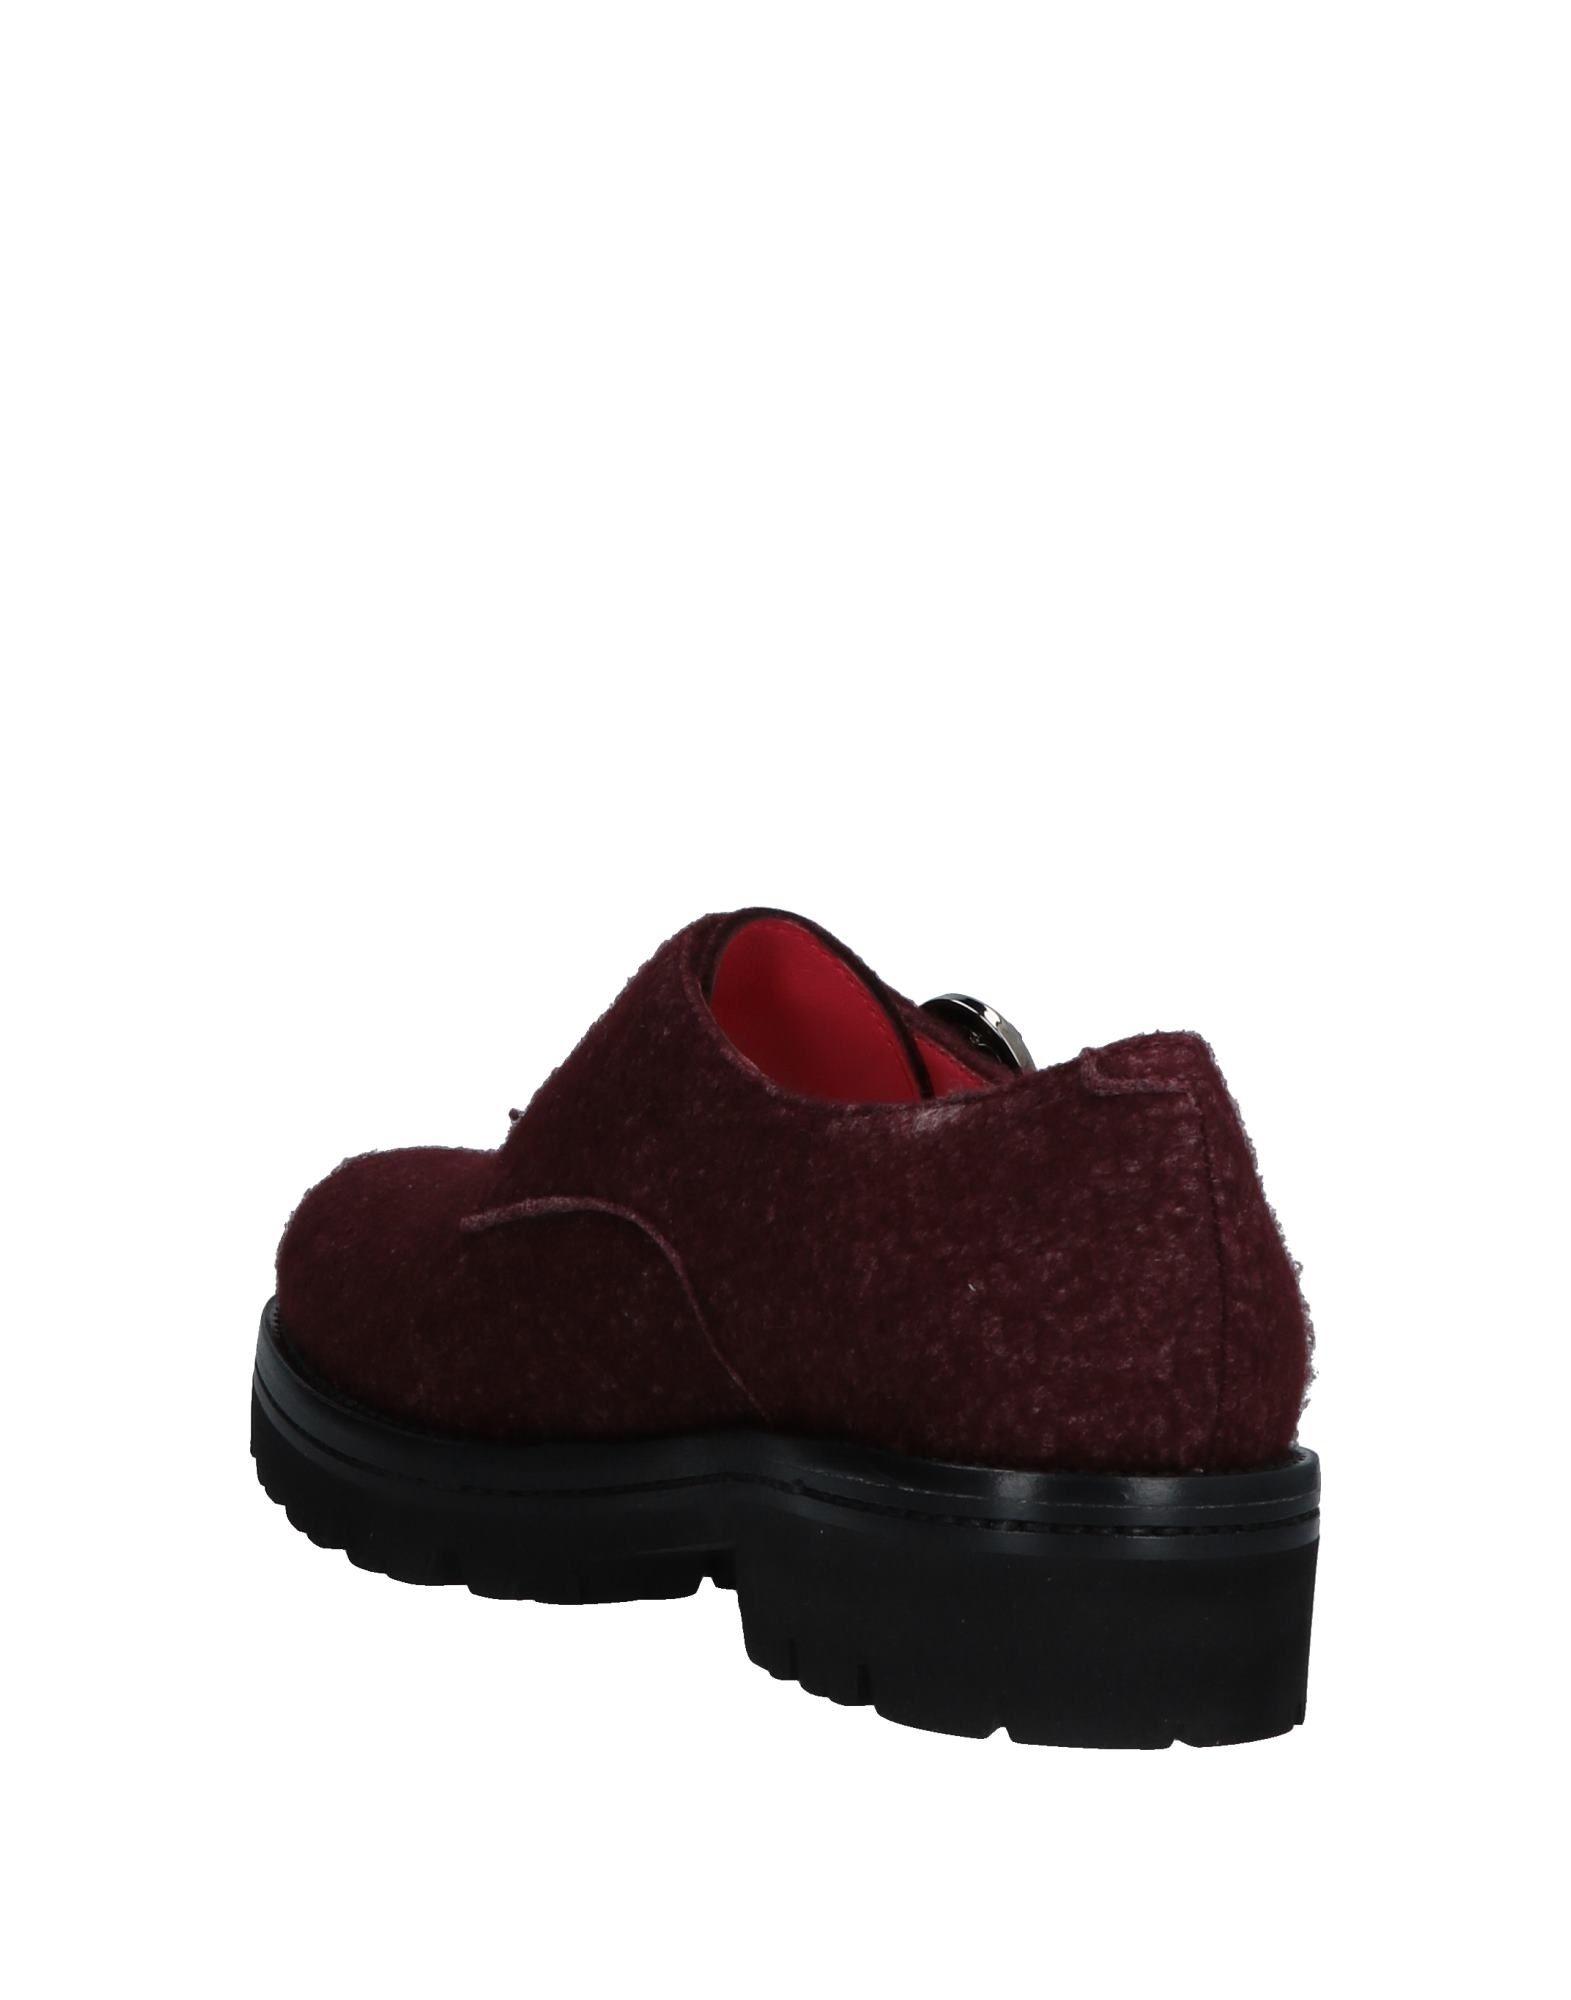 Stilvolle billige Mokassins Schuhe Pas De Rouge Mokassins billige Damen 11510944TU d30ada